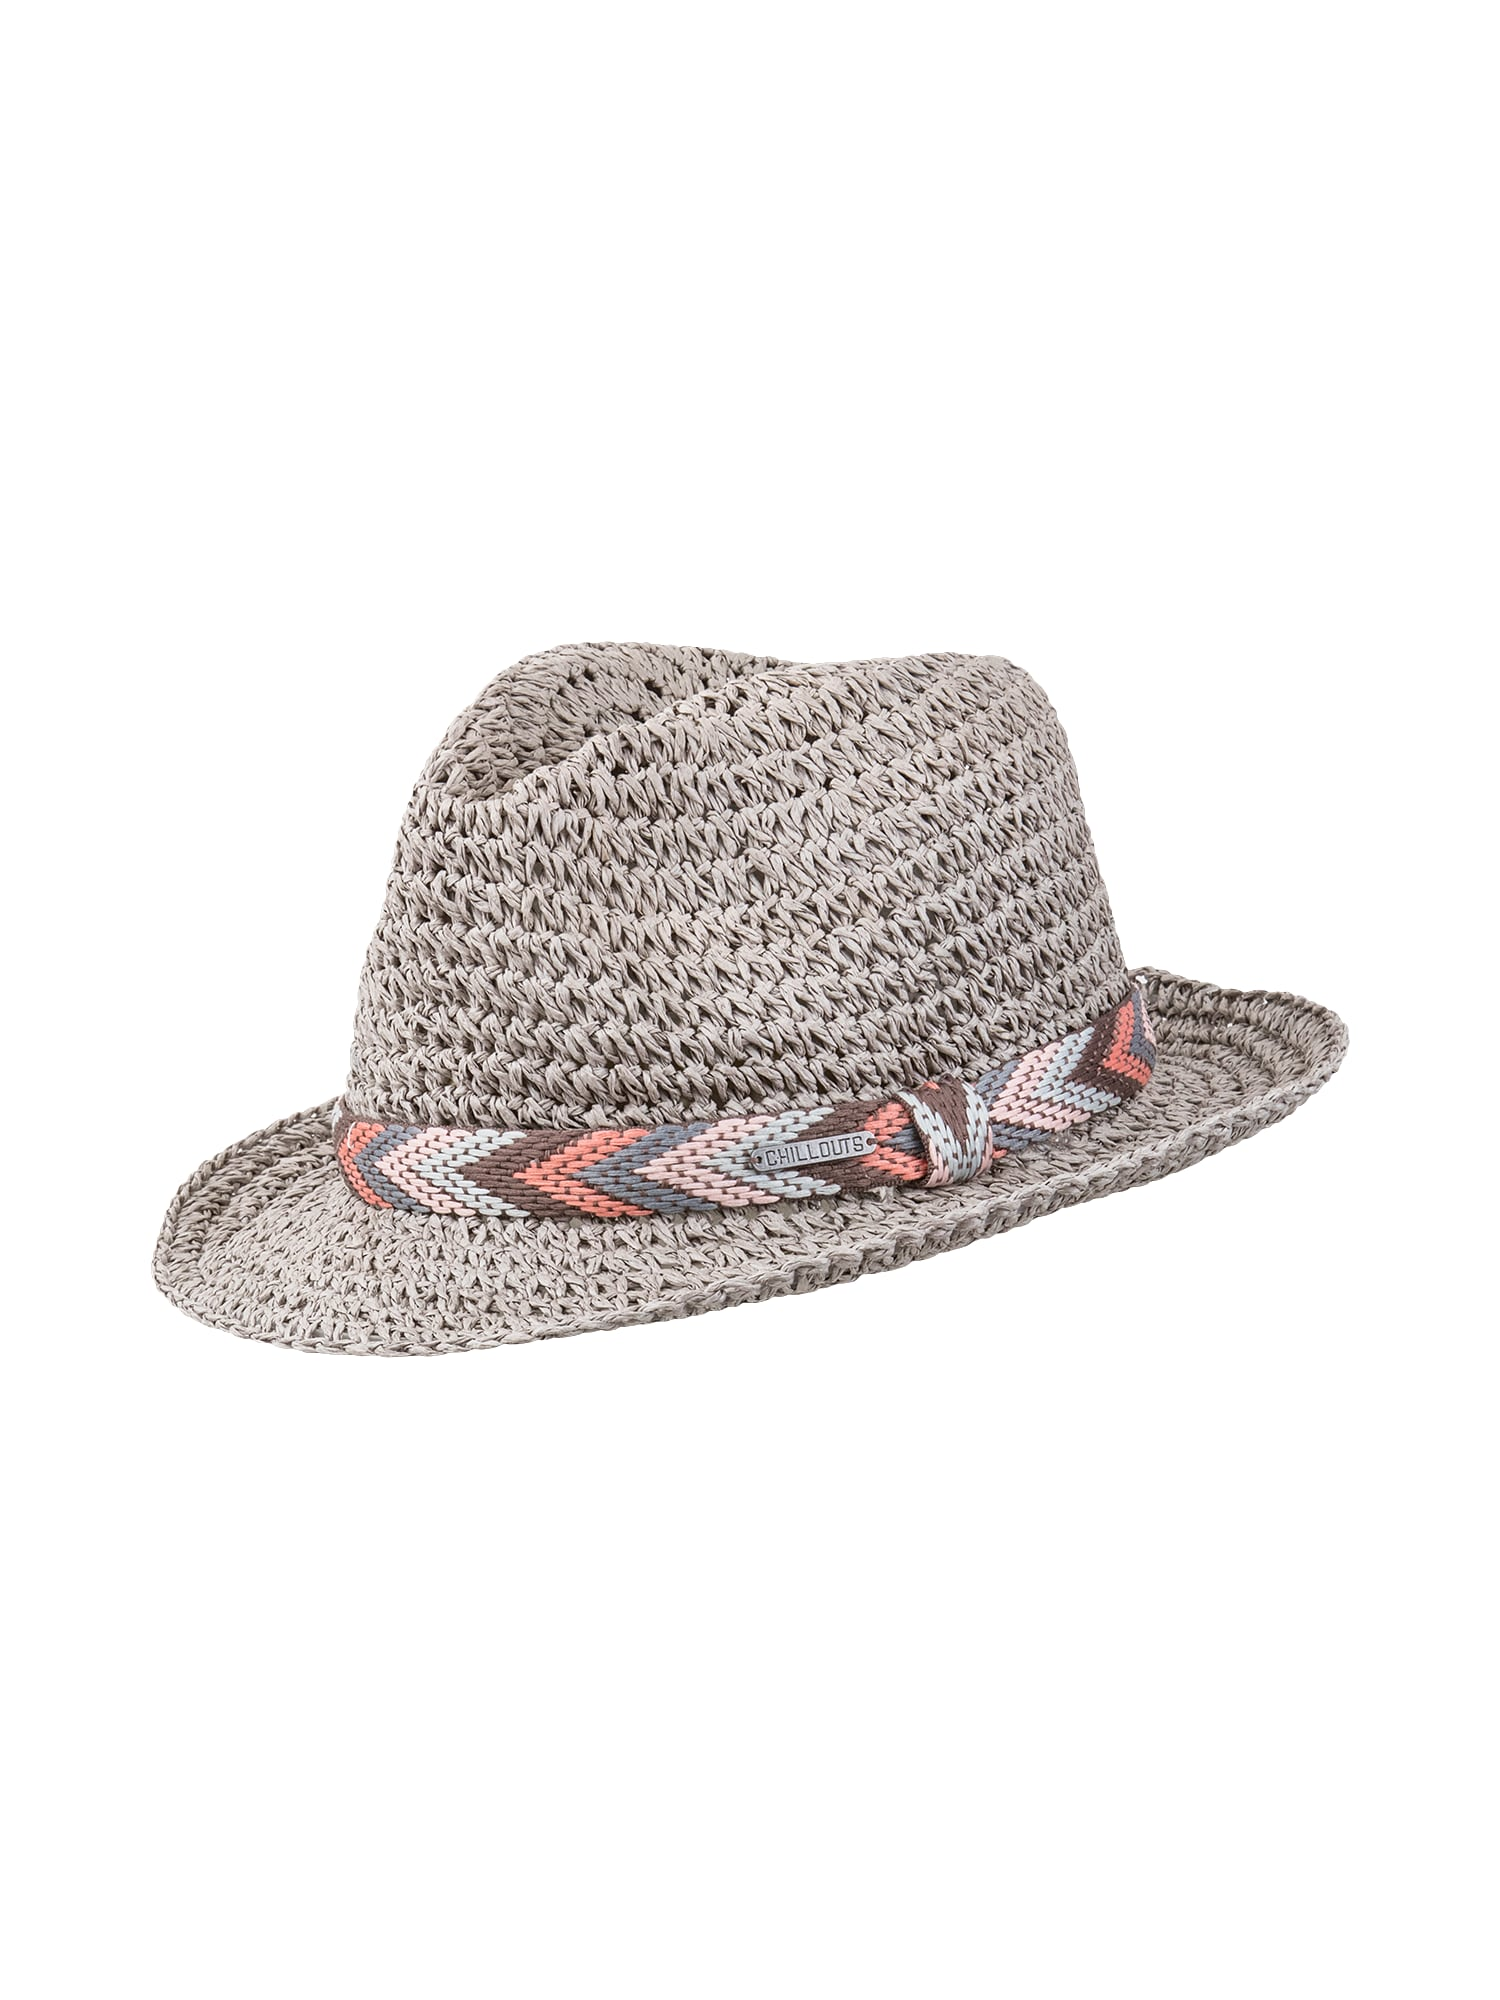 Klobouk Medellin Hat šedá Chillouts